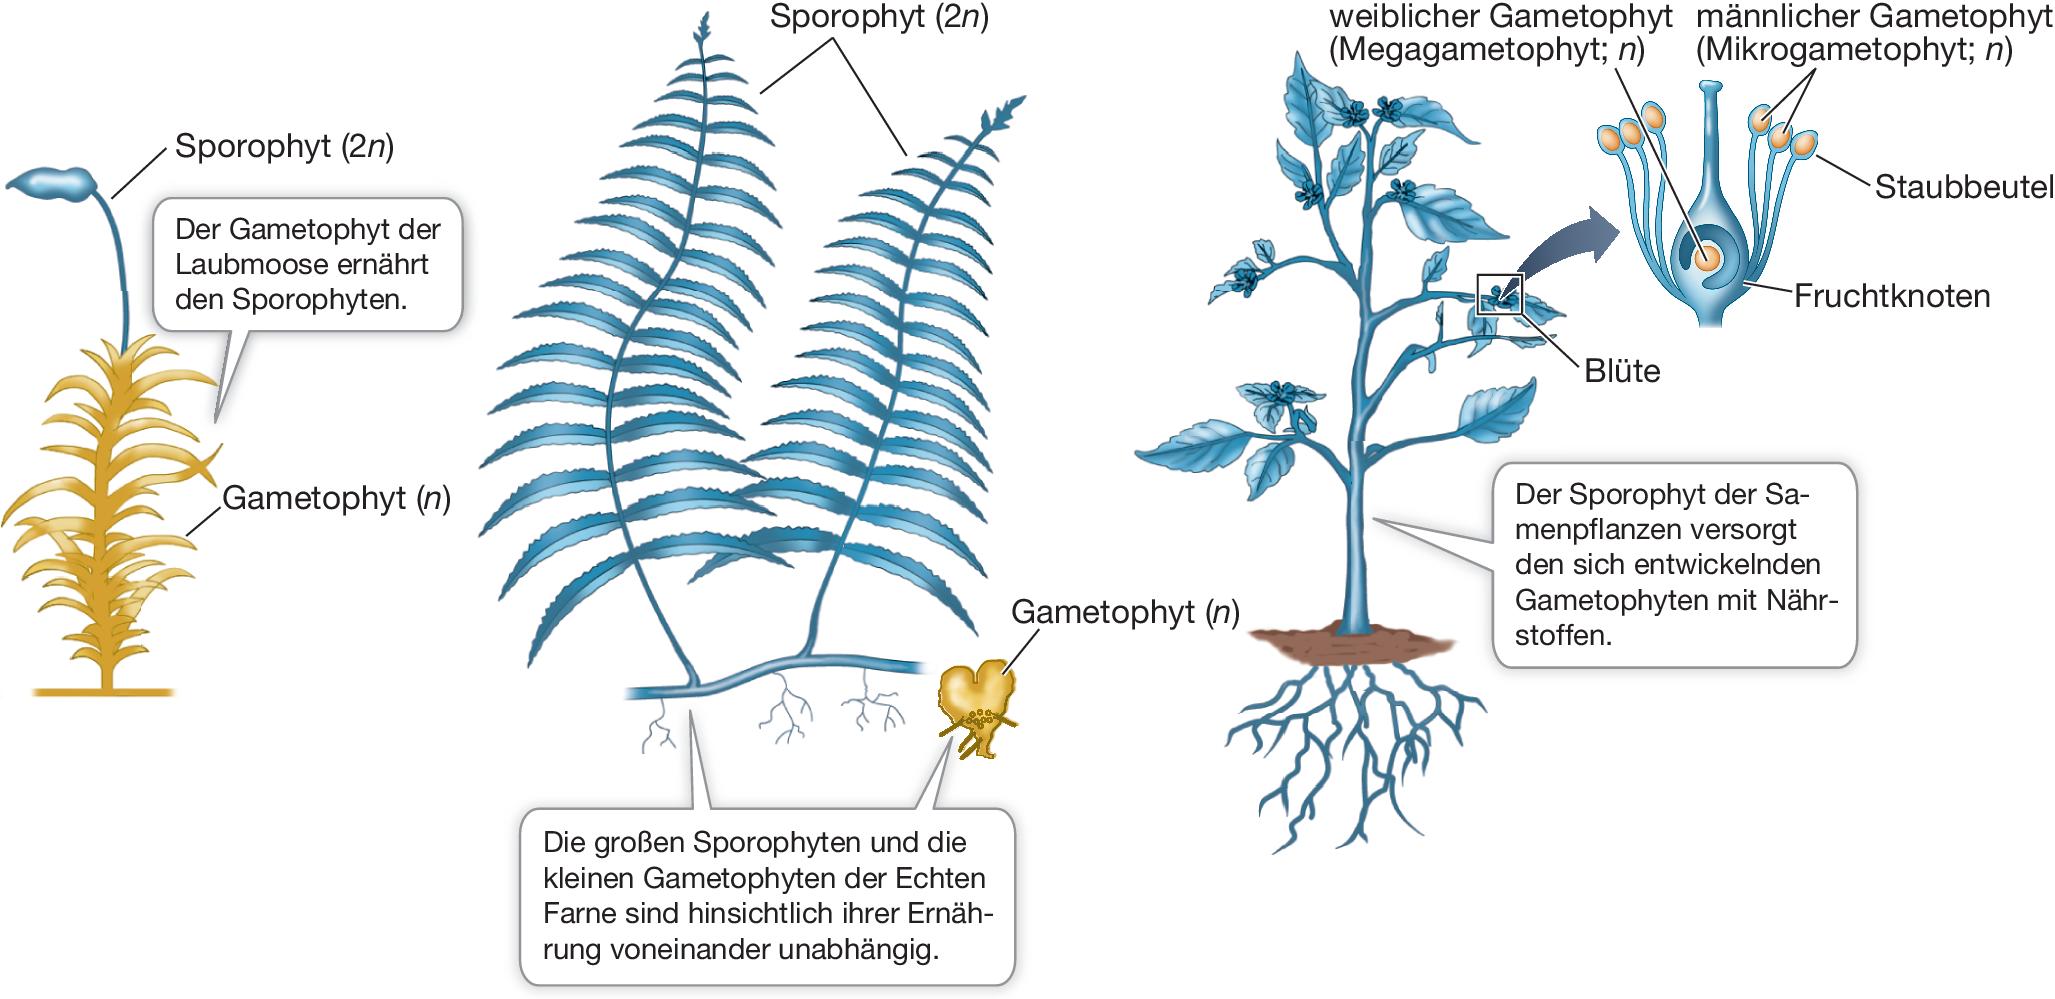 Fach Naturwissenschaften Thema Samenpflanzen 15